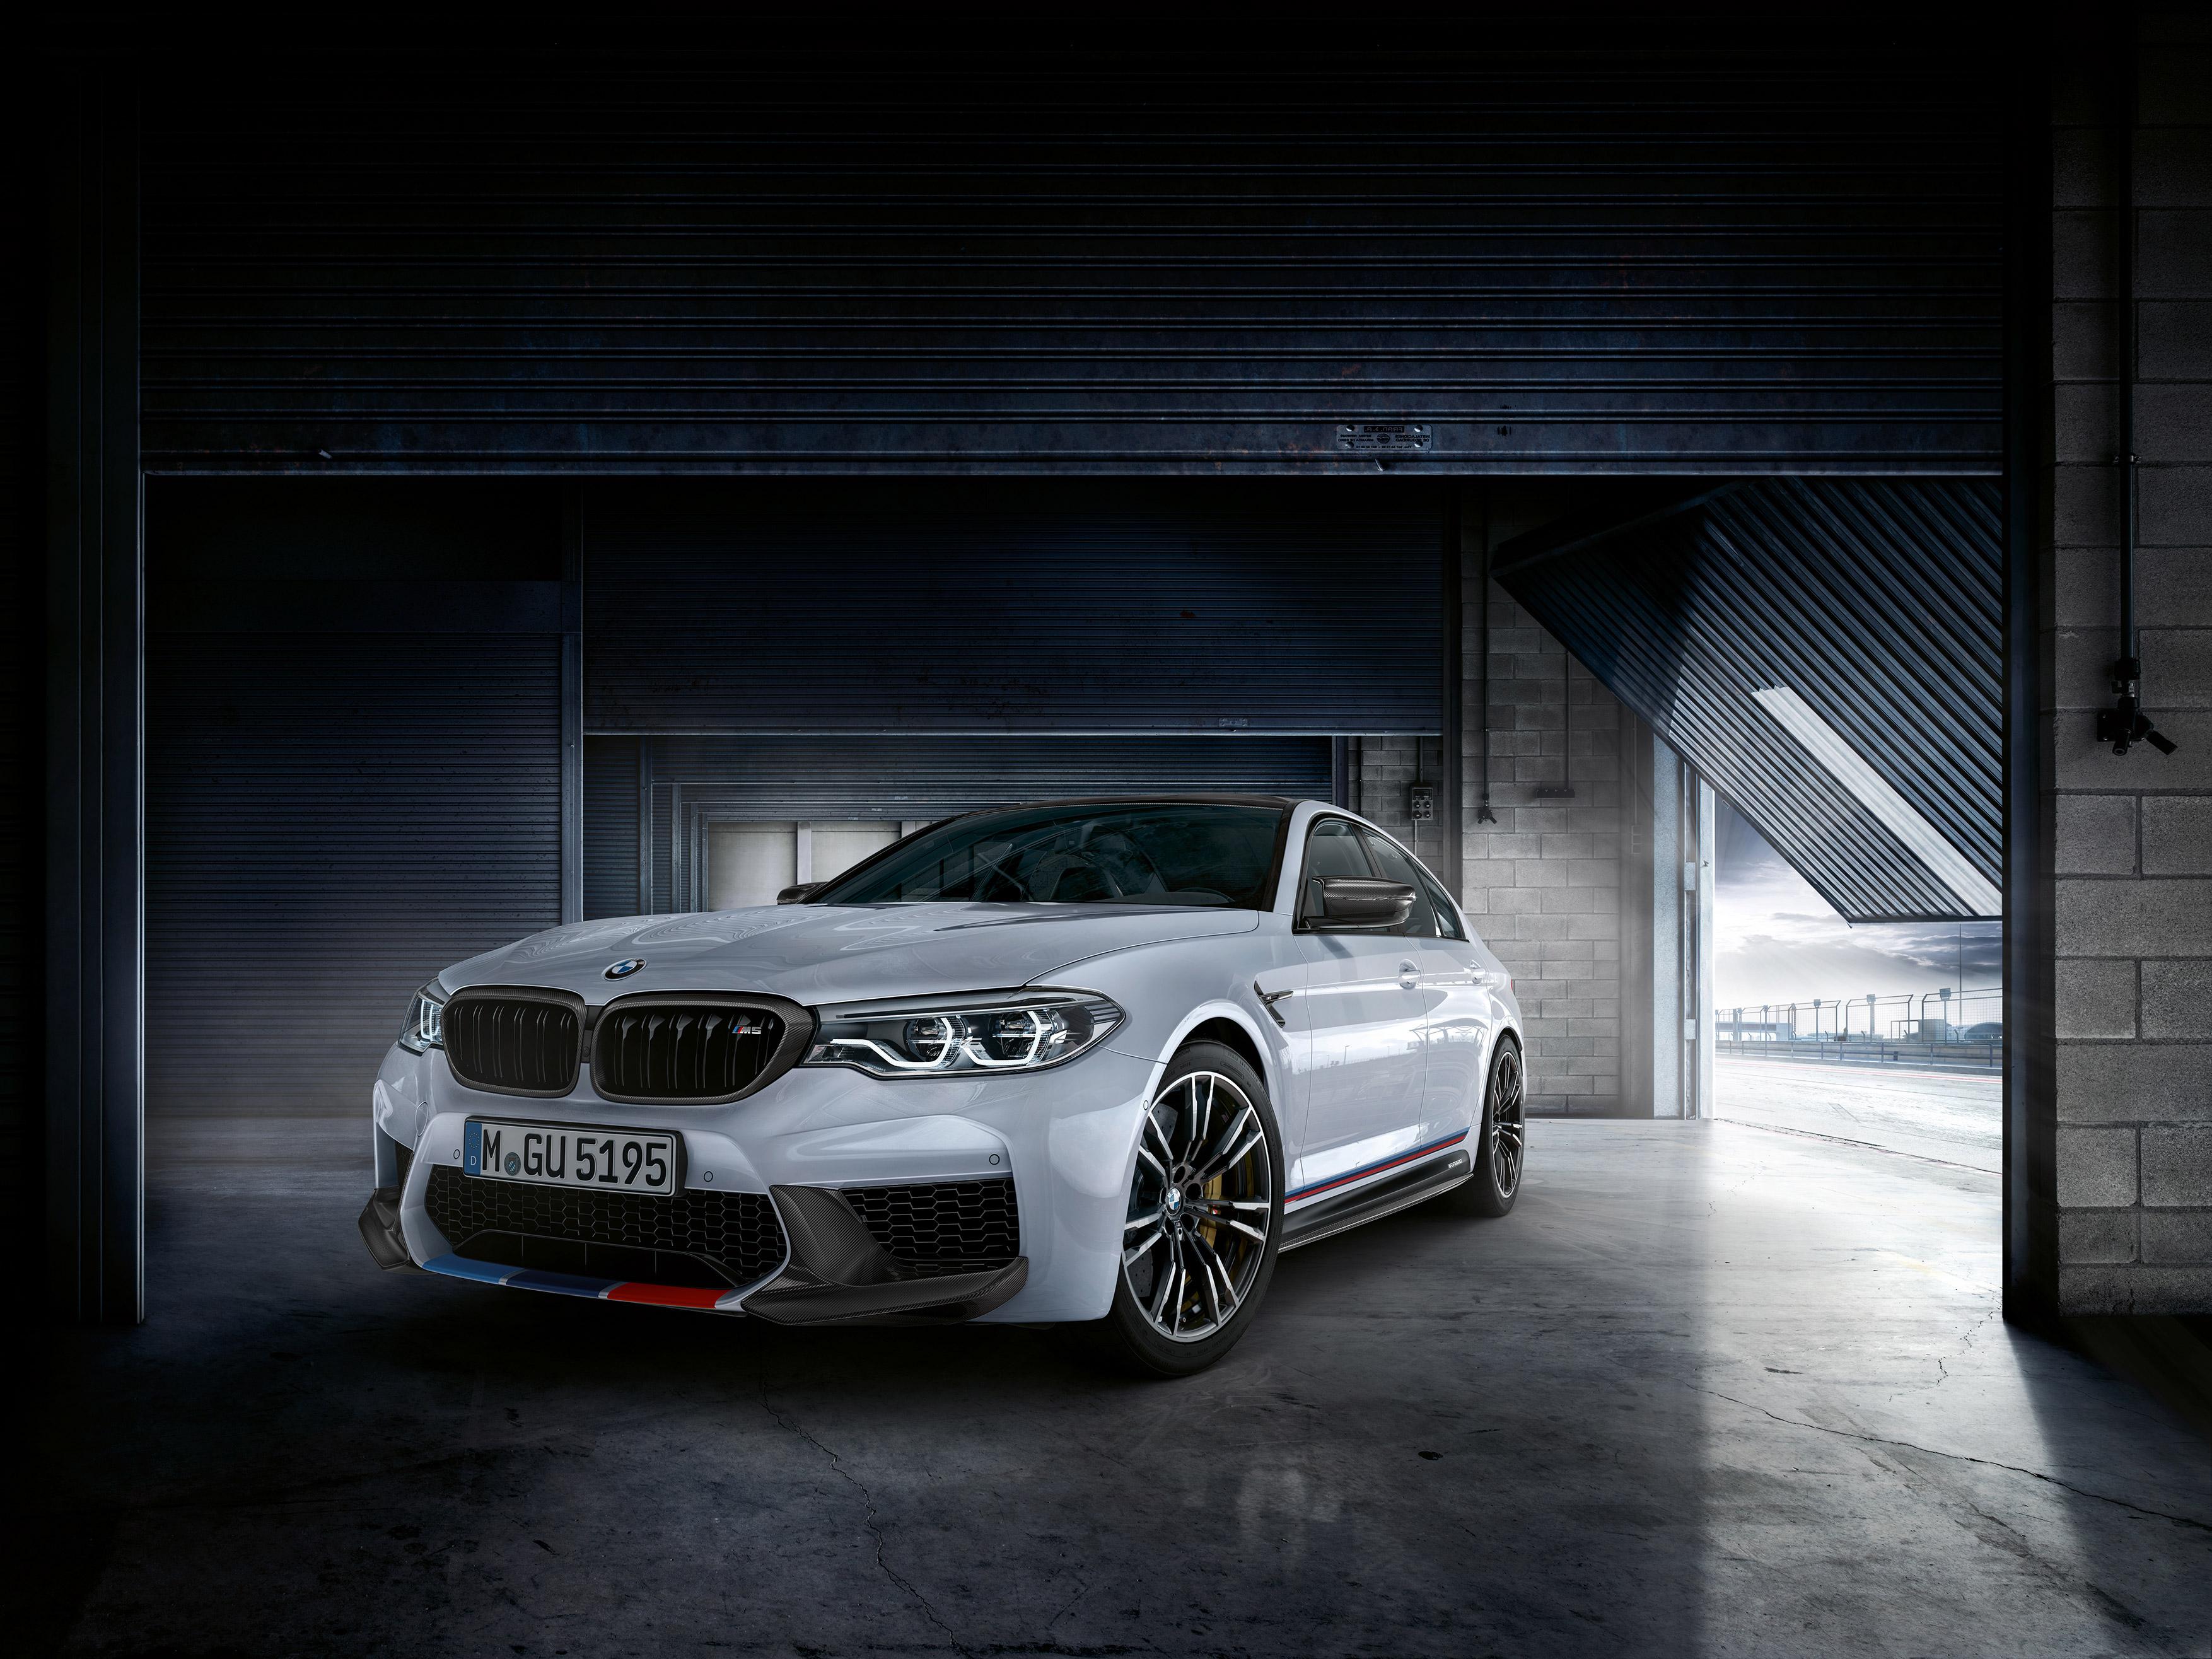 BMW M5 Zoom Video Background